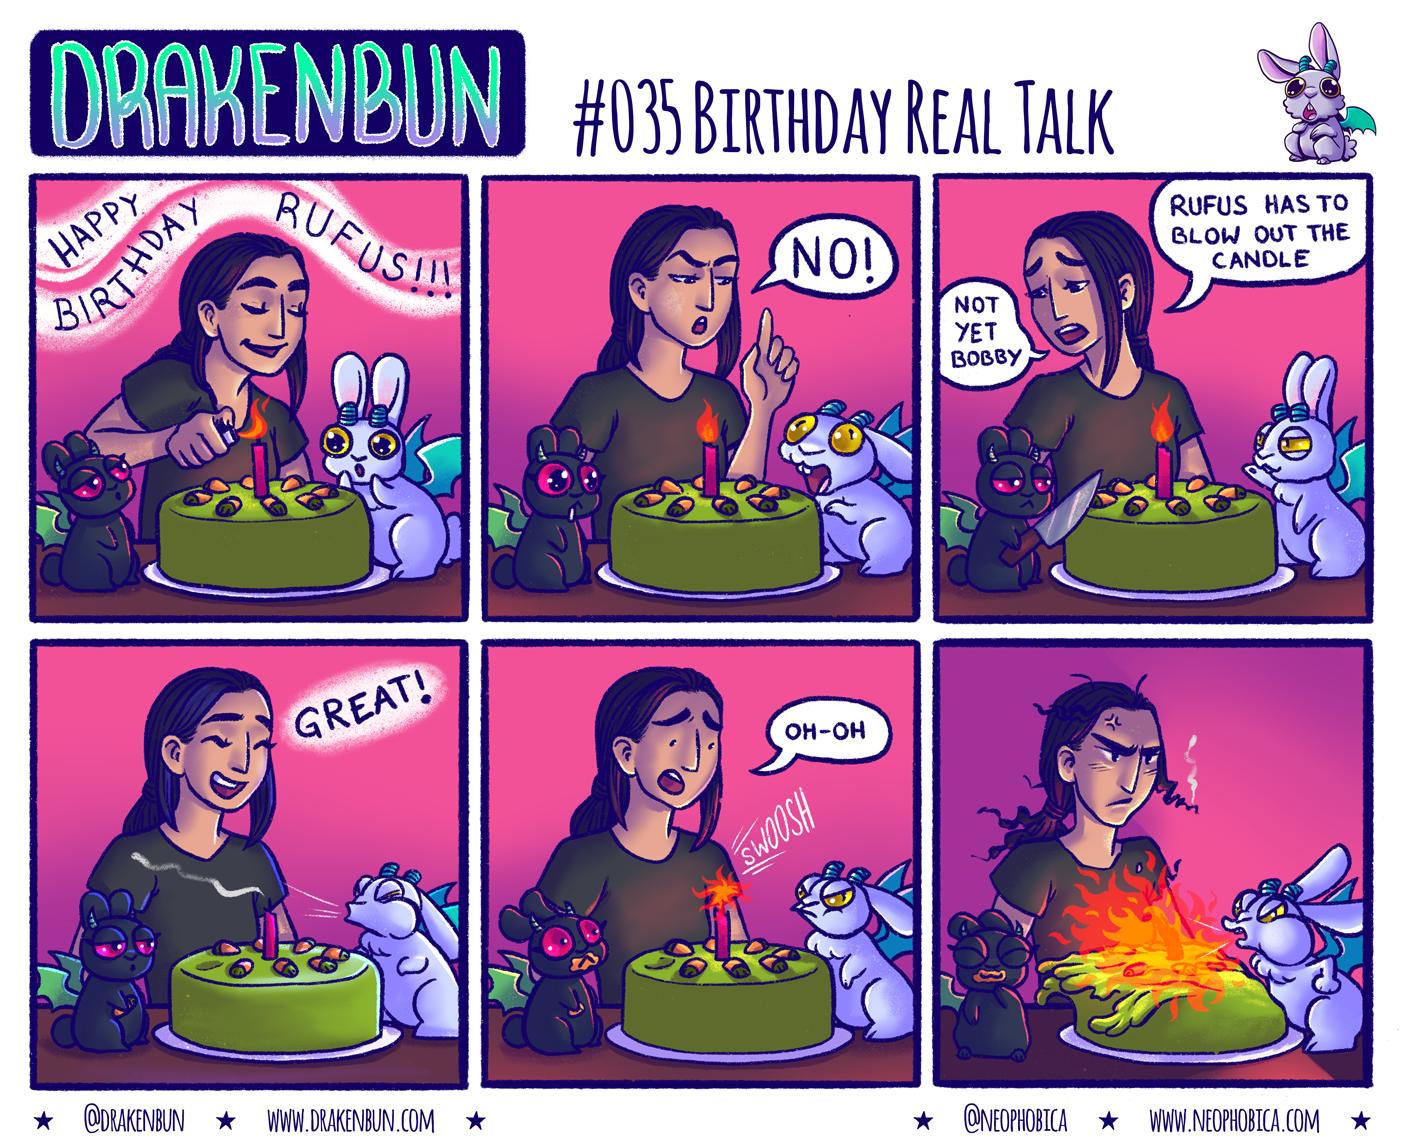 #035 Birthday Real Talk